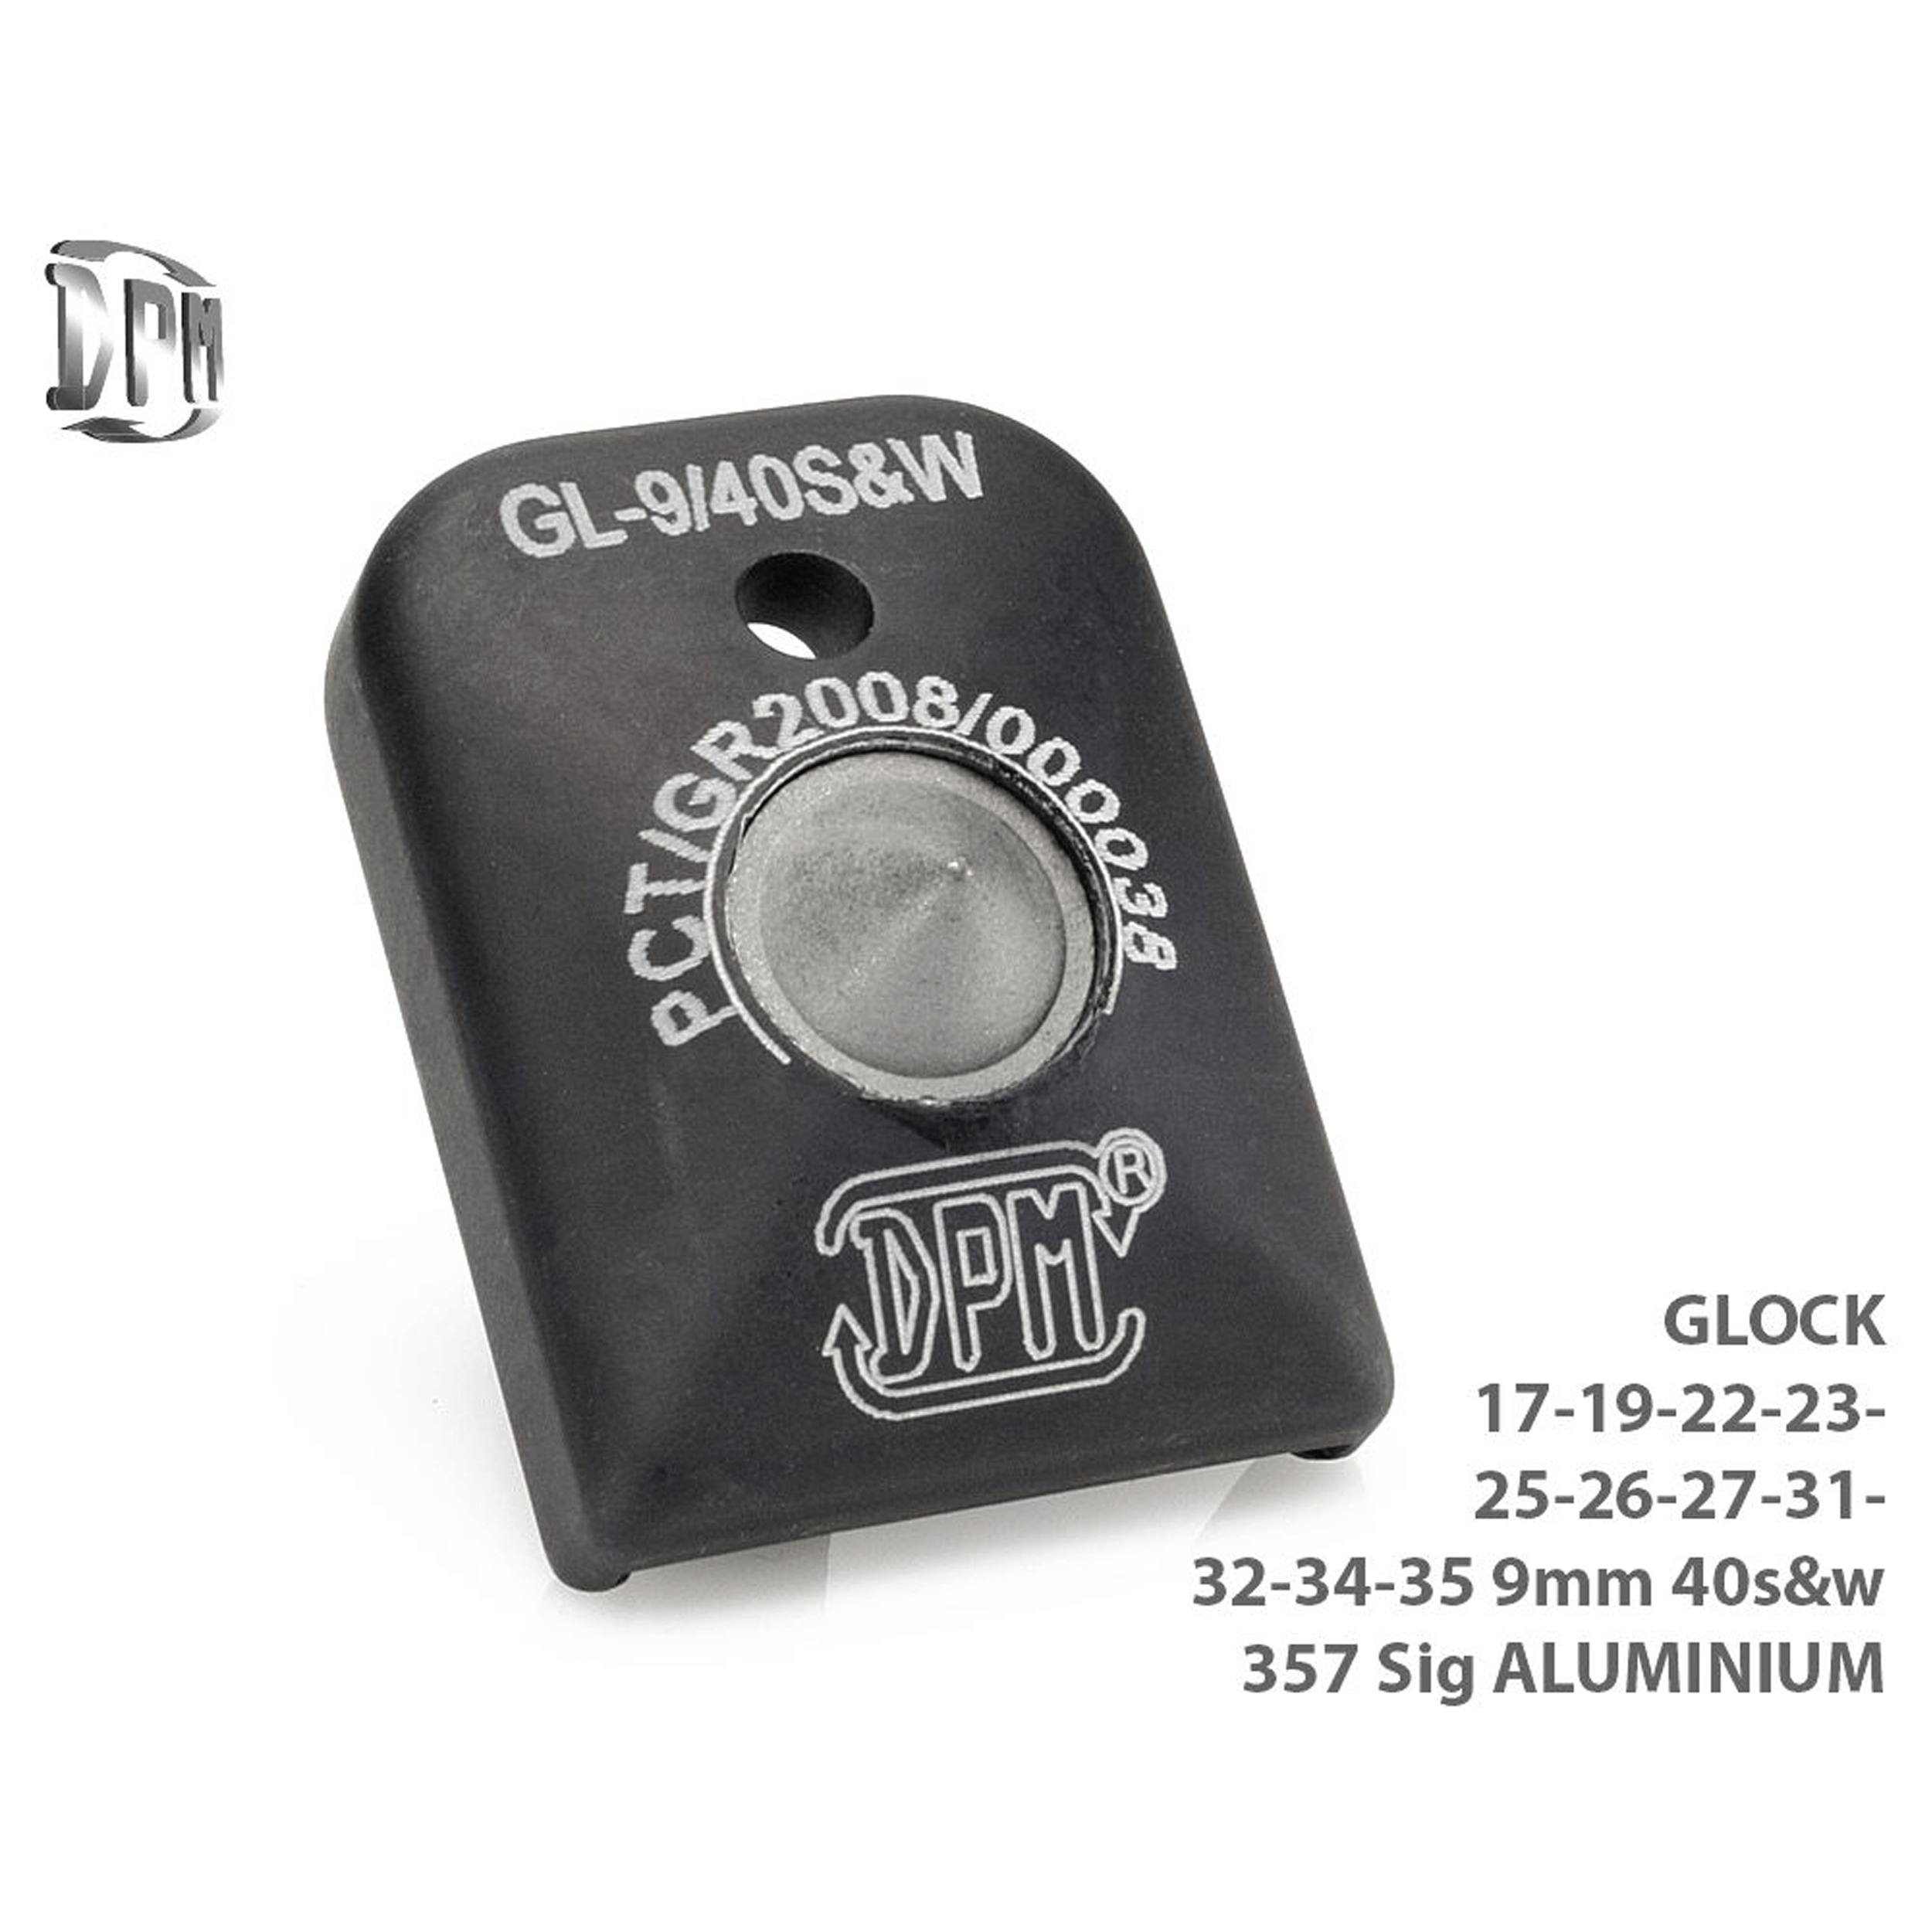 Glock 17 / 19 Aluminum Magazine Floorplate - Glass Breaker